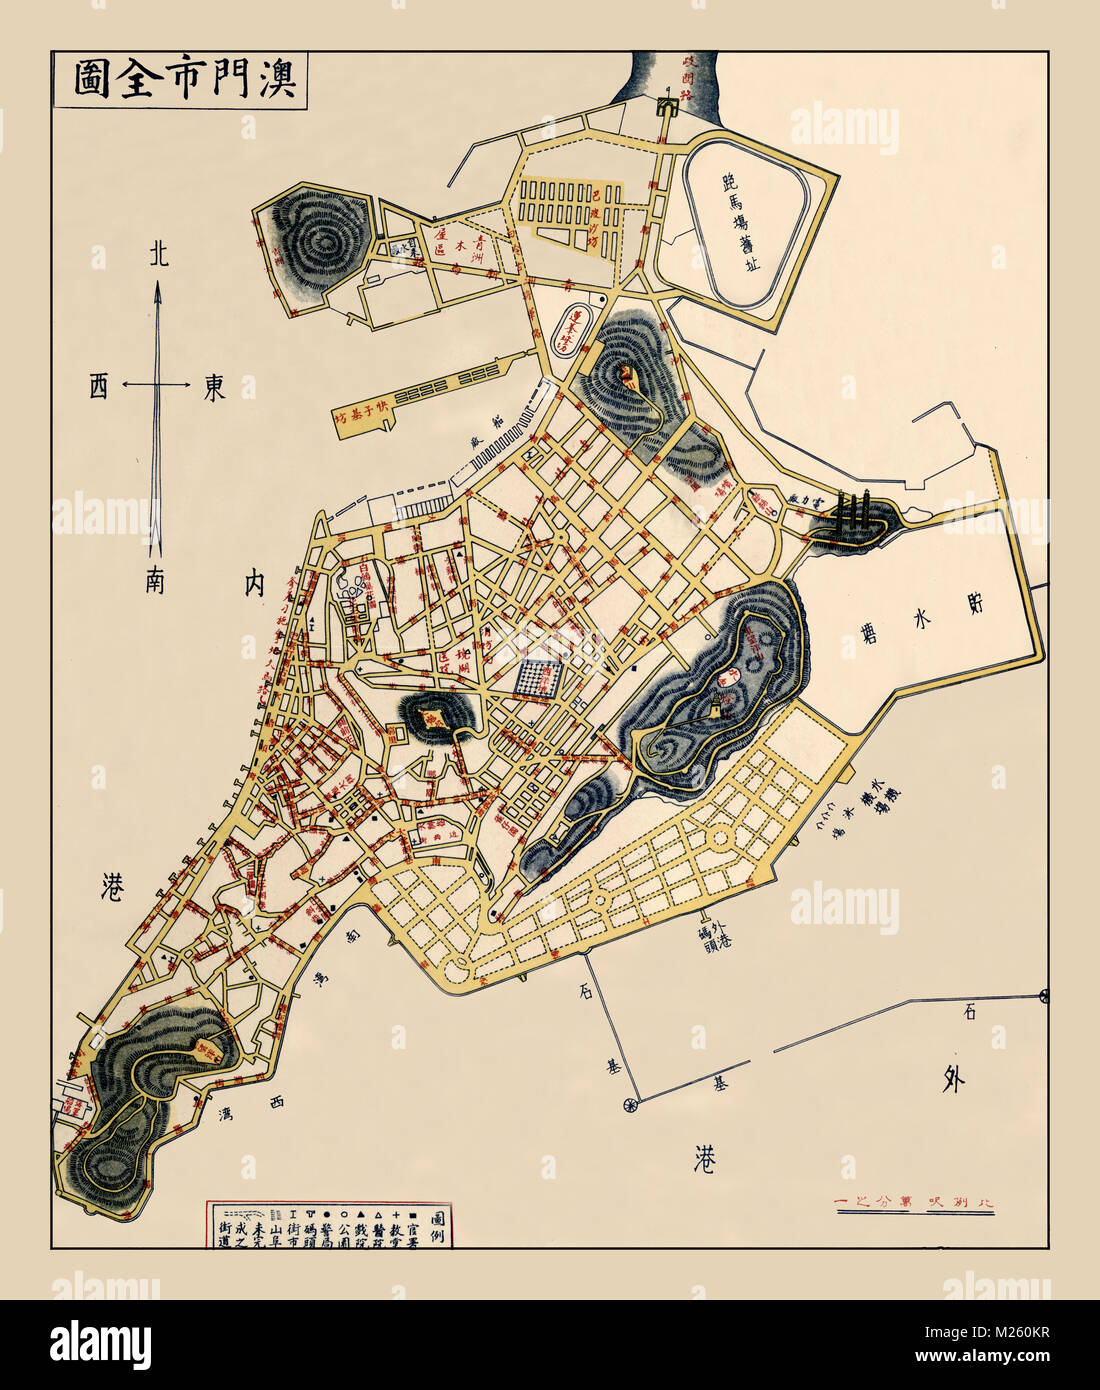 Historical Map Of Macau China Circa 1953 Stock Photo 173465259 Alamy